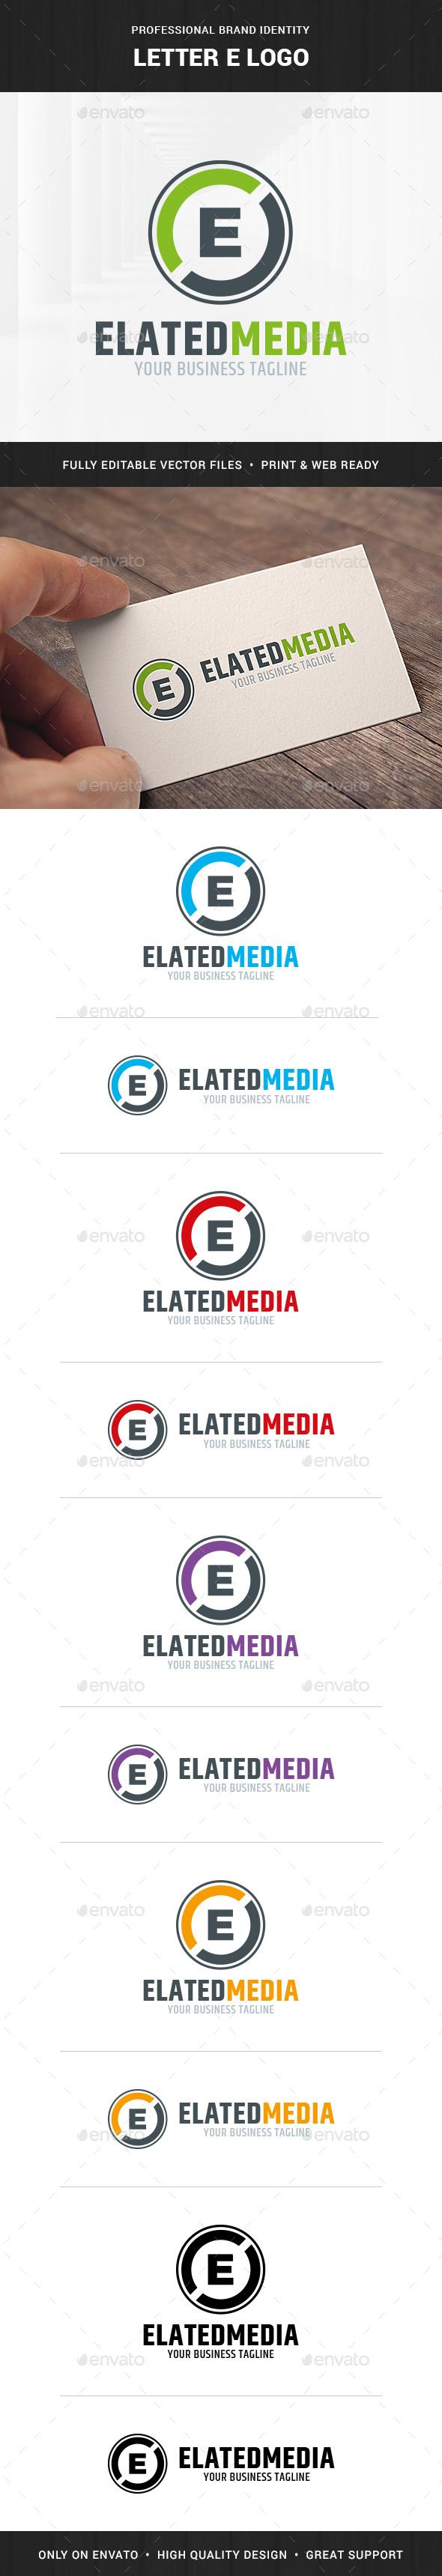 Letter E Logo Template - Letters Logo Templates